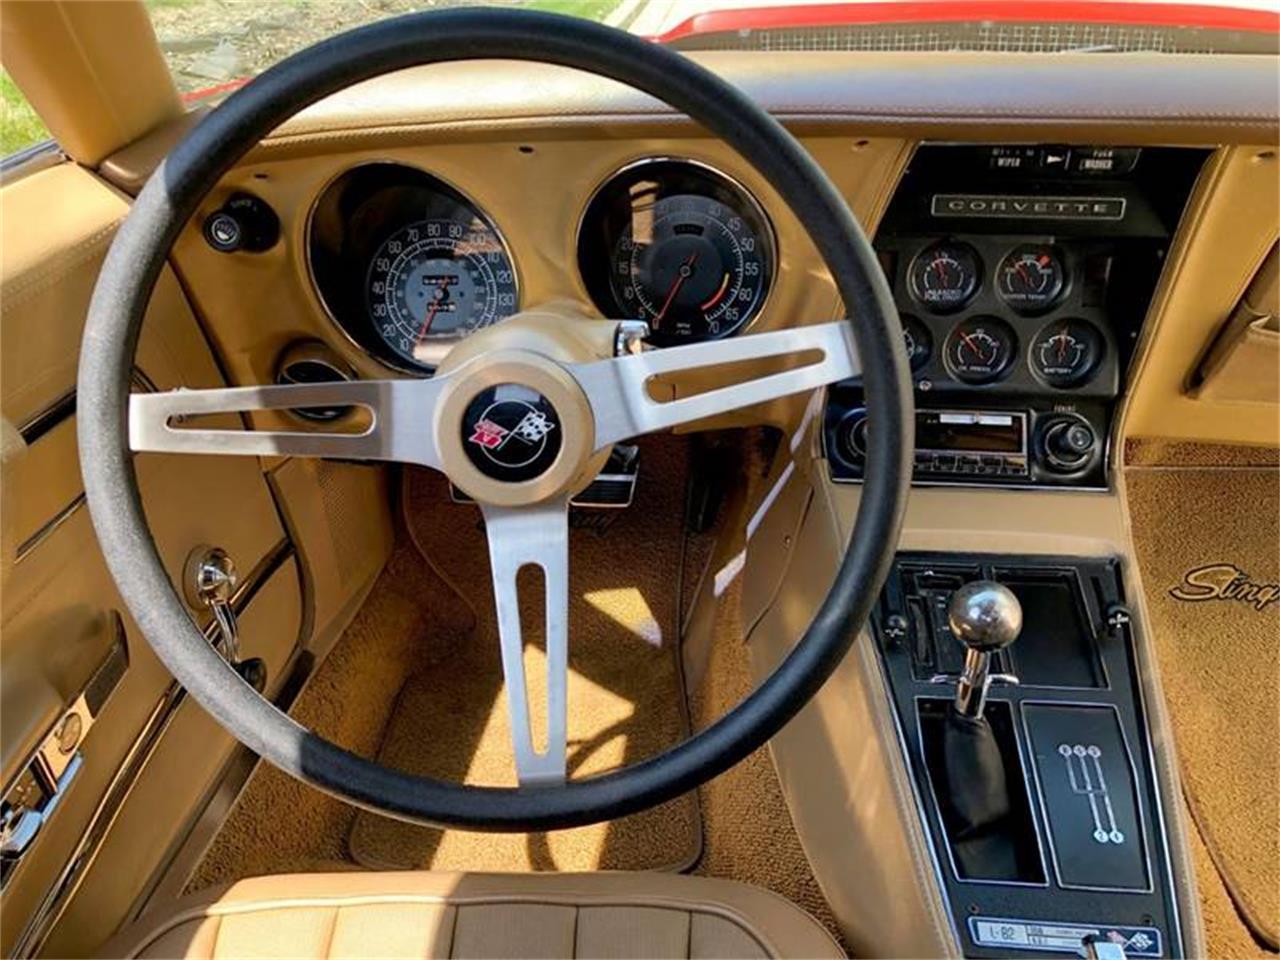 1975 Chevrolet Corvette (CC-1256456) for sale in Burr Ridge, Illinois